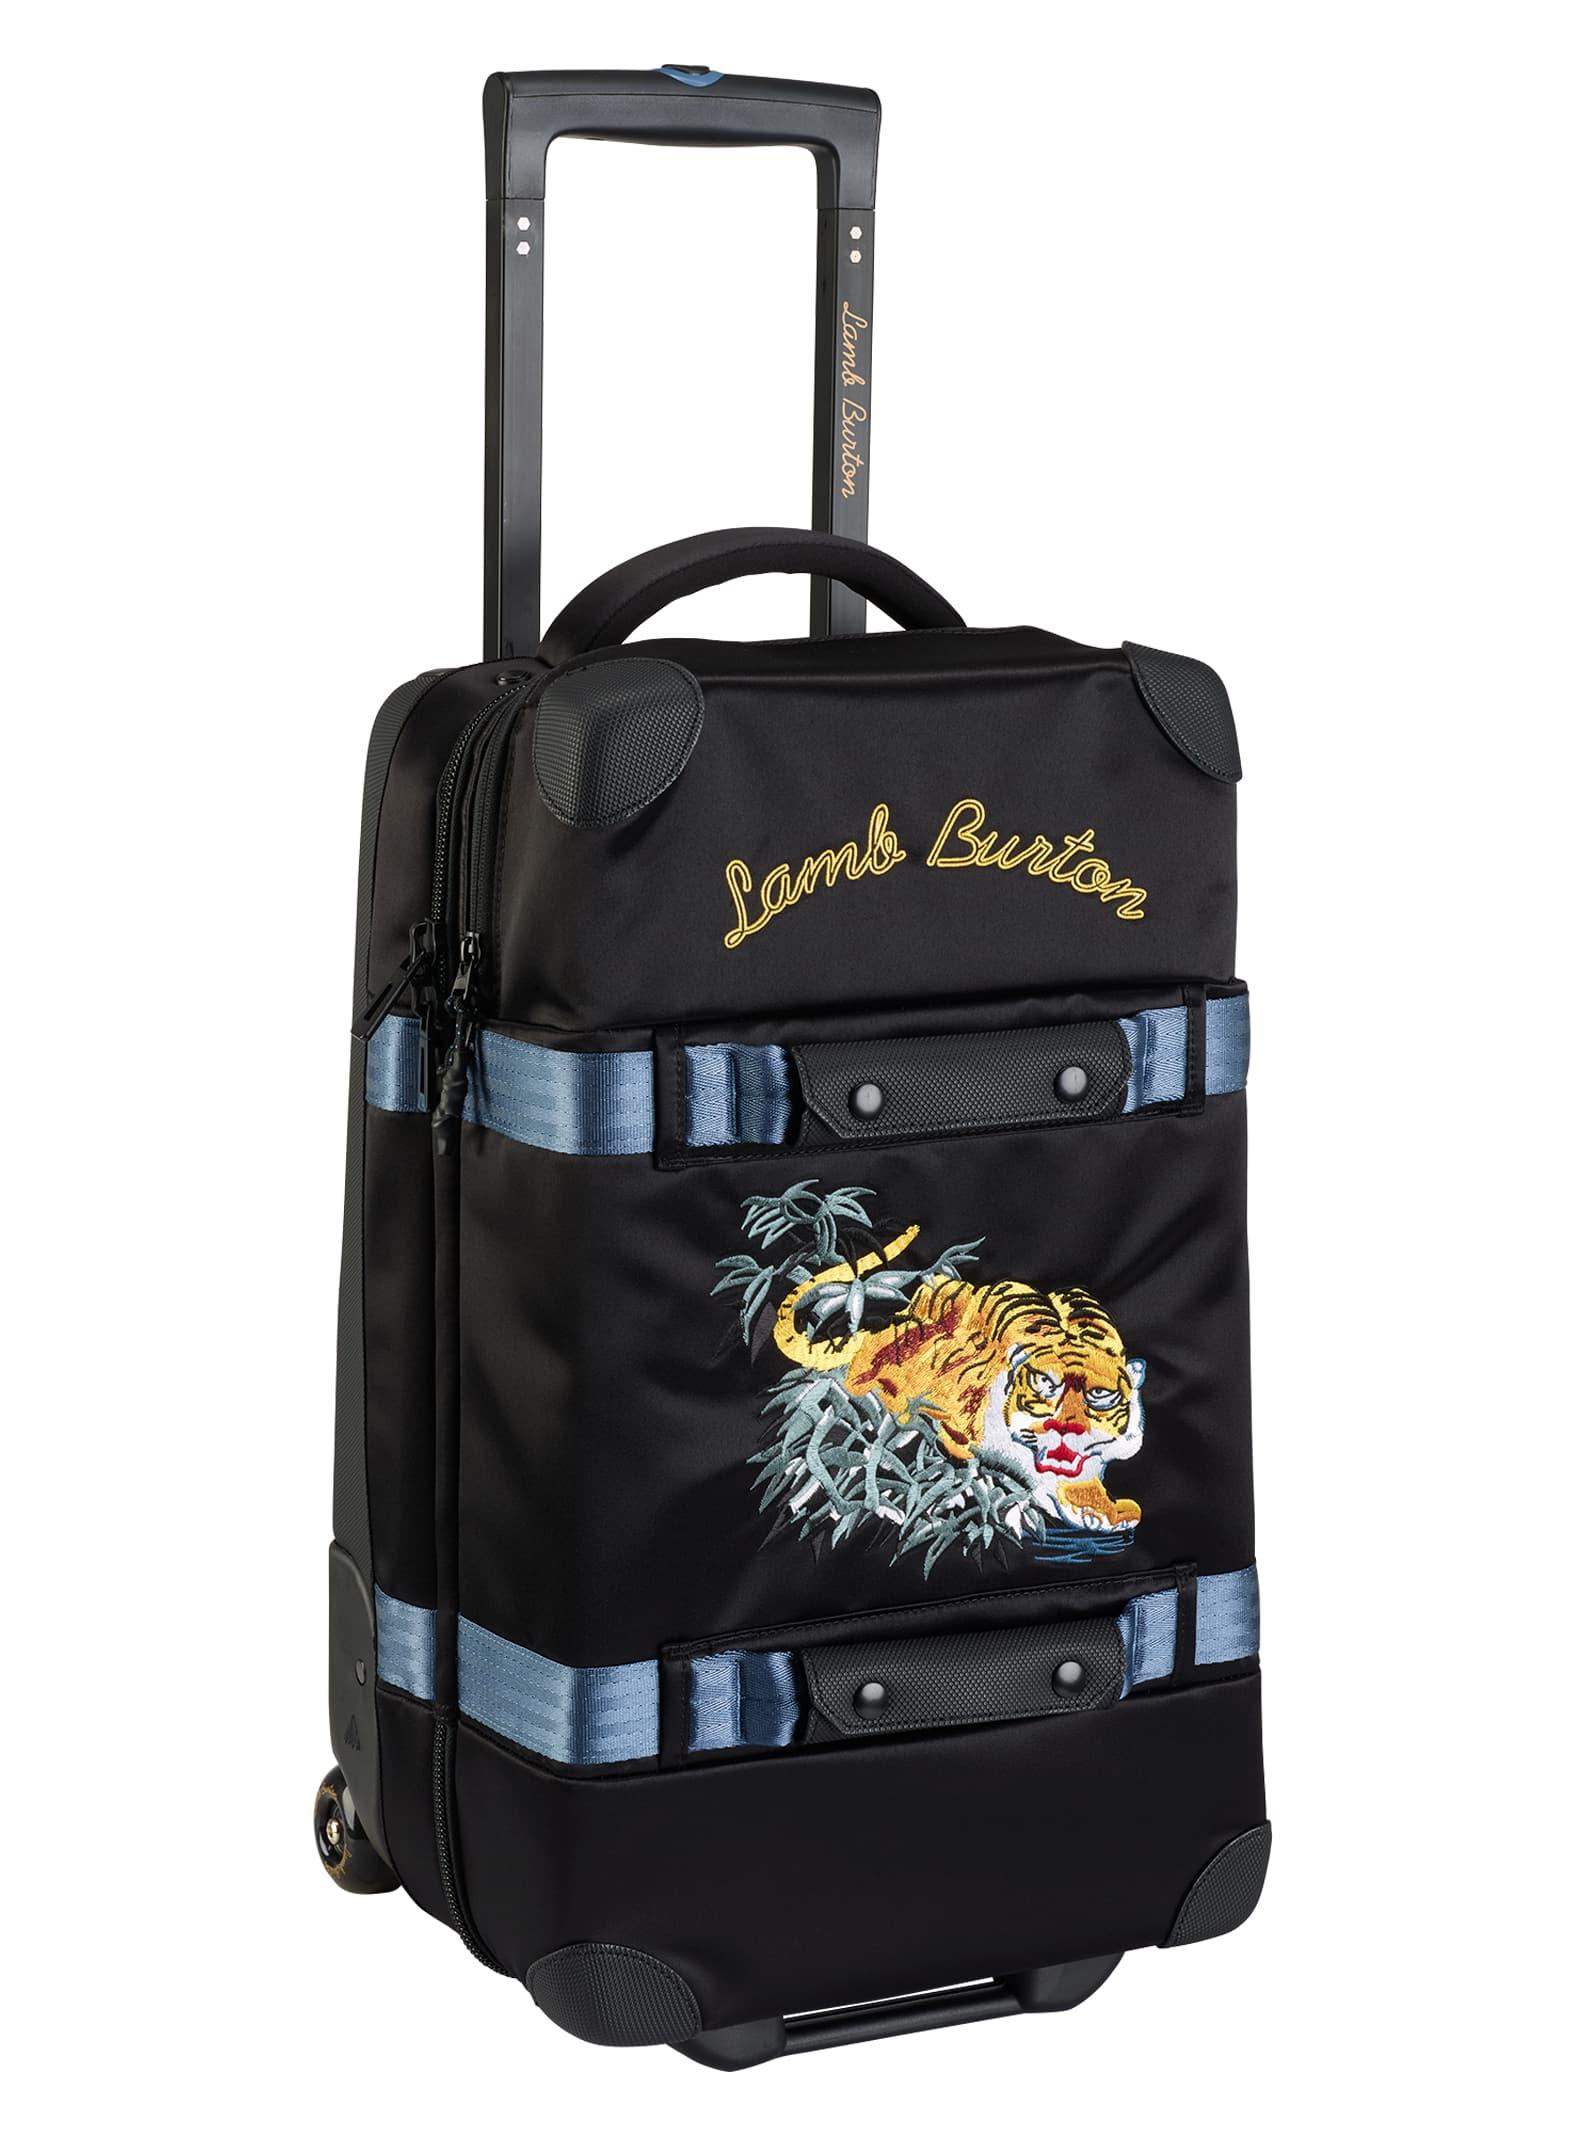 53606e5d40361 L.A.M.B. x Burton Burton Wheelie Flight Deck Travel Bag | Burton Snowboards  Fall 2017